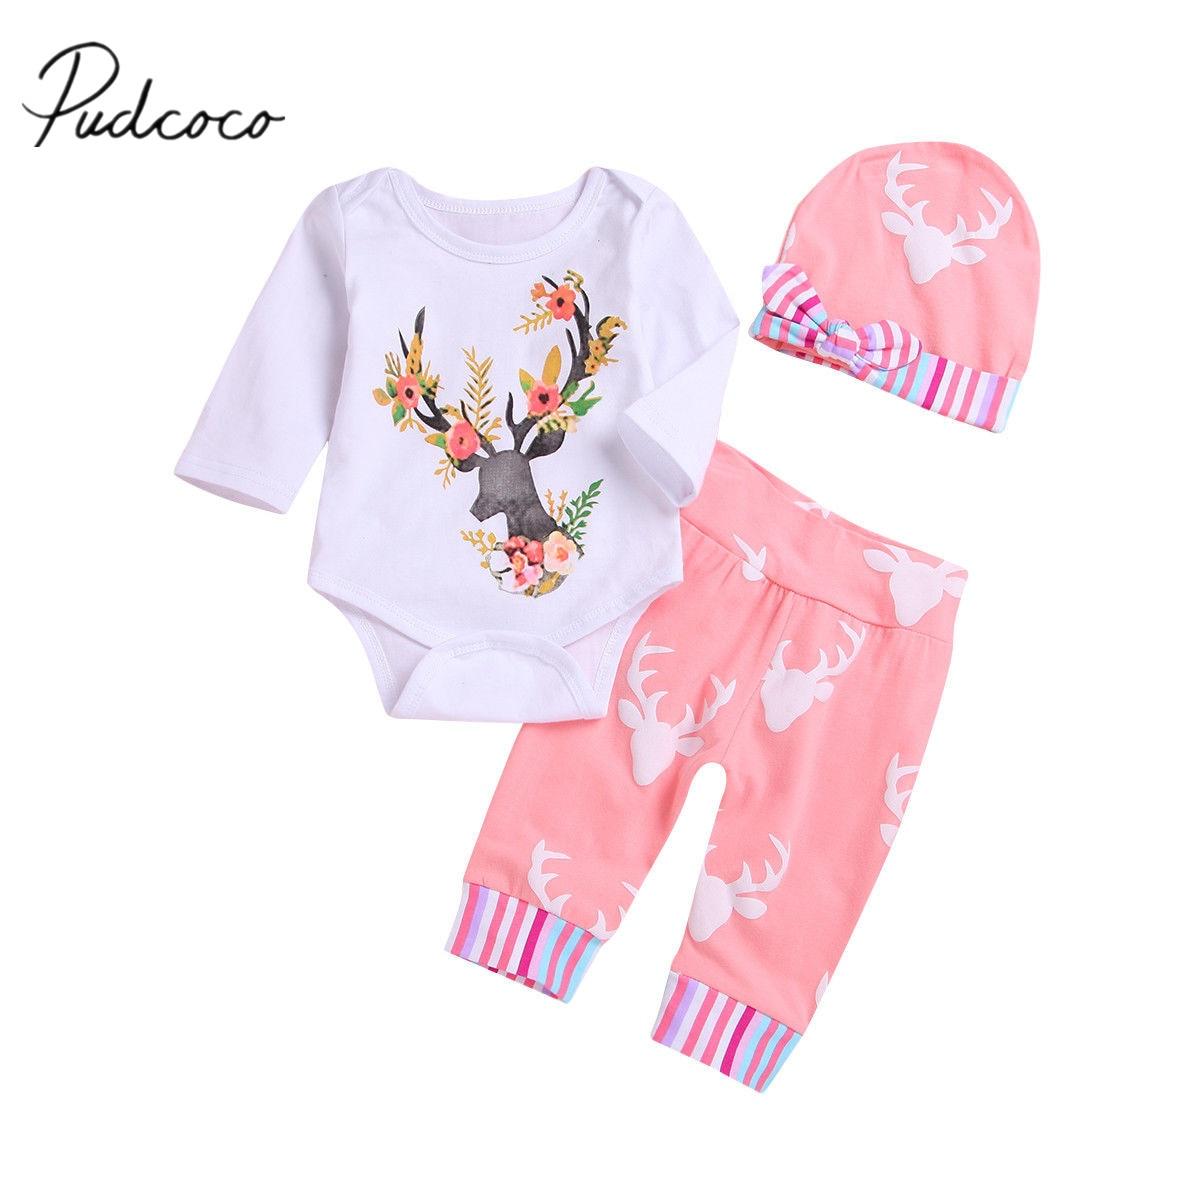 2018 Brand New Toddler Kids Baby Girls Xmas Clothes 3PCS Cartoon Floral Deer Print Long Sleeve Romper Tops+Pants+Hats Sets 0-1Y